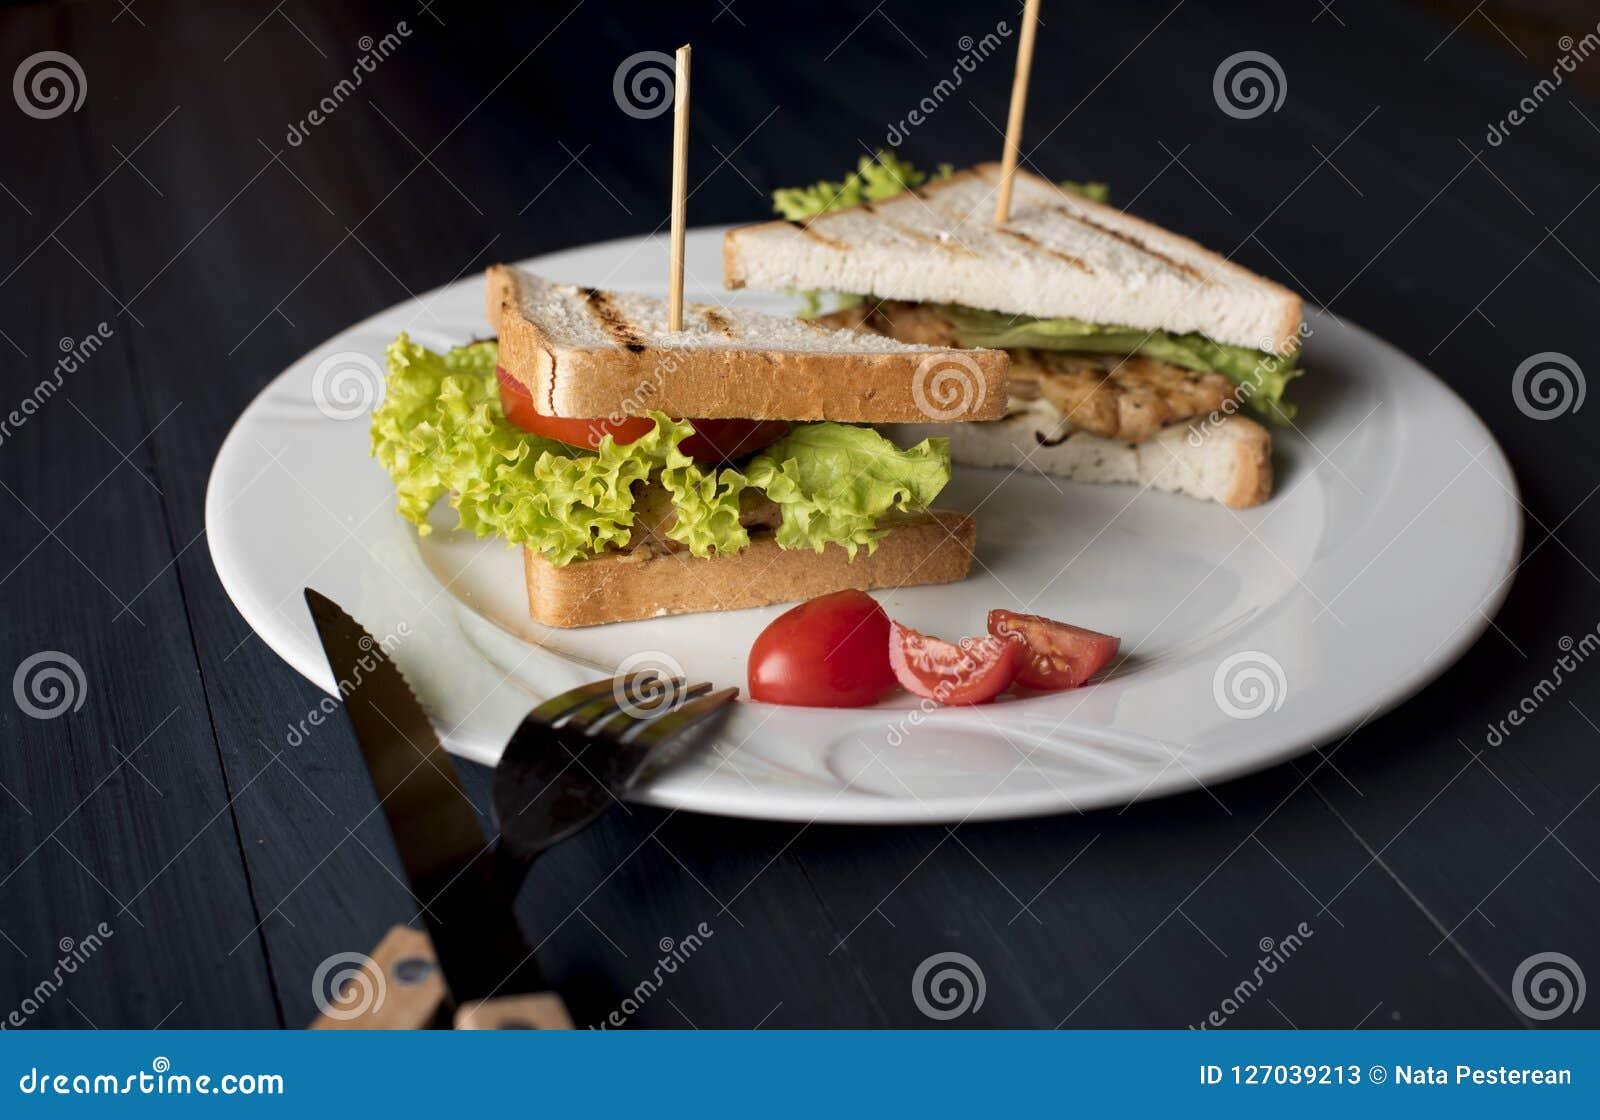 Ściska z serem, pieczonym kurczakiem, pomidorami i sałatką,